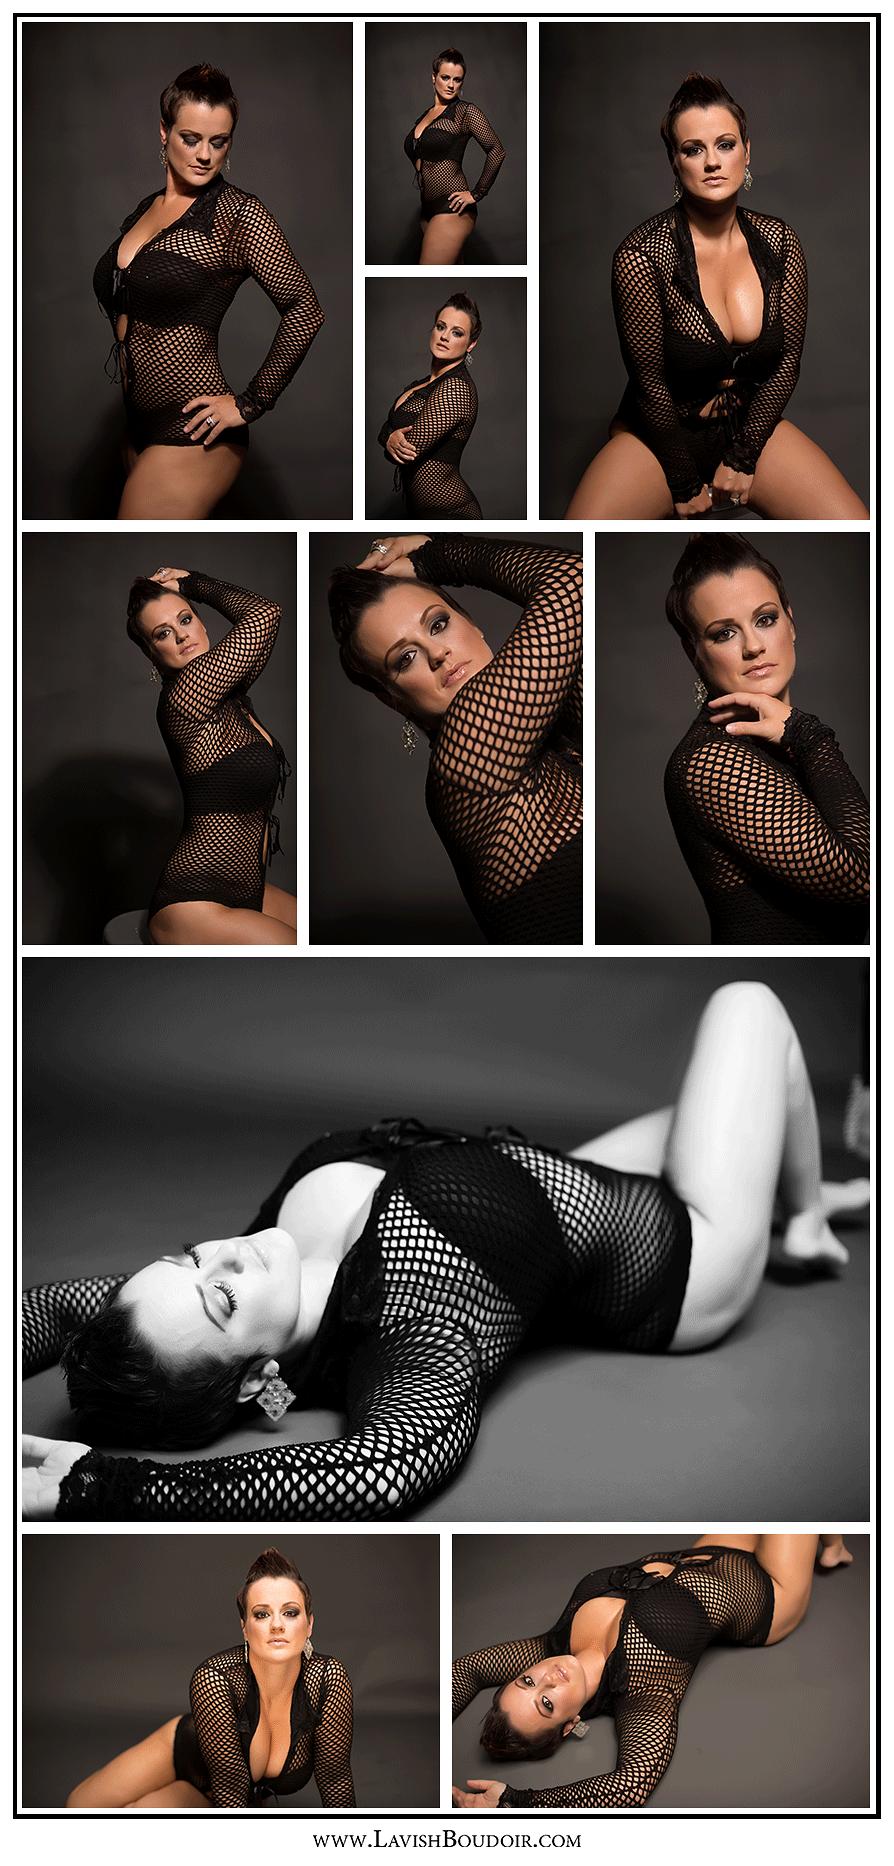 Copyright Leslie Cersovski @ Lavish Boudoir www.LavishBoudoir... - Valdosta - Georgia - all rights reserved fishnet, model, badass